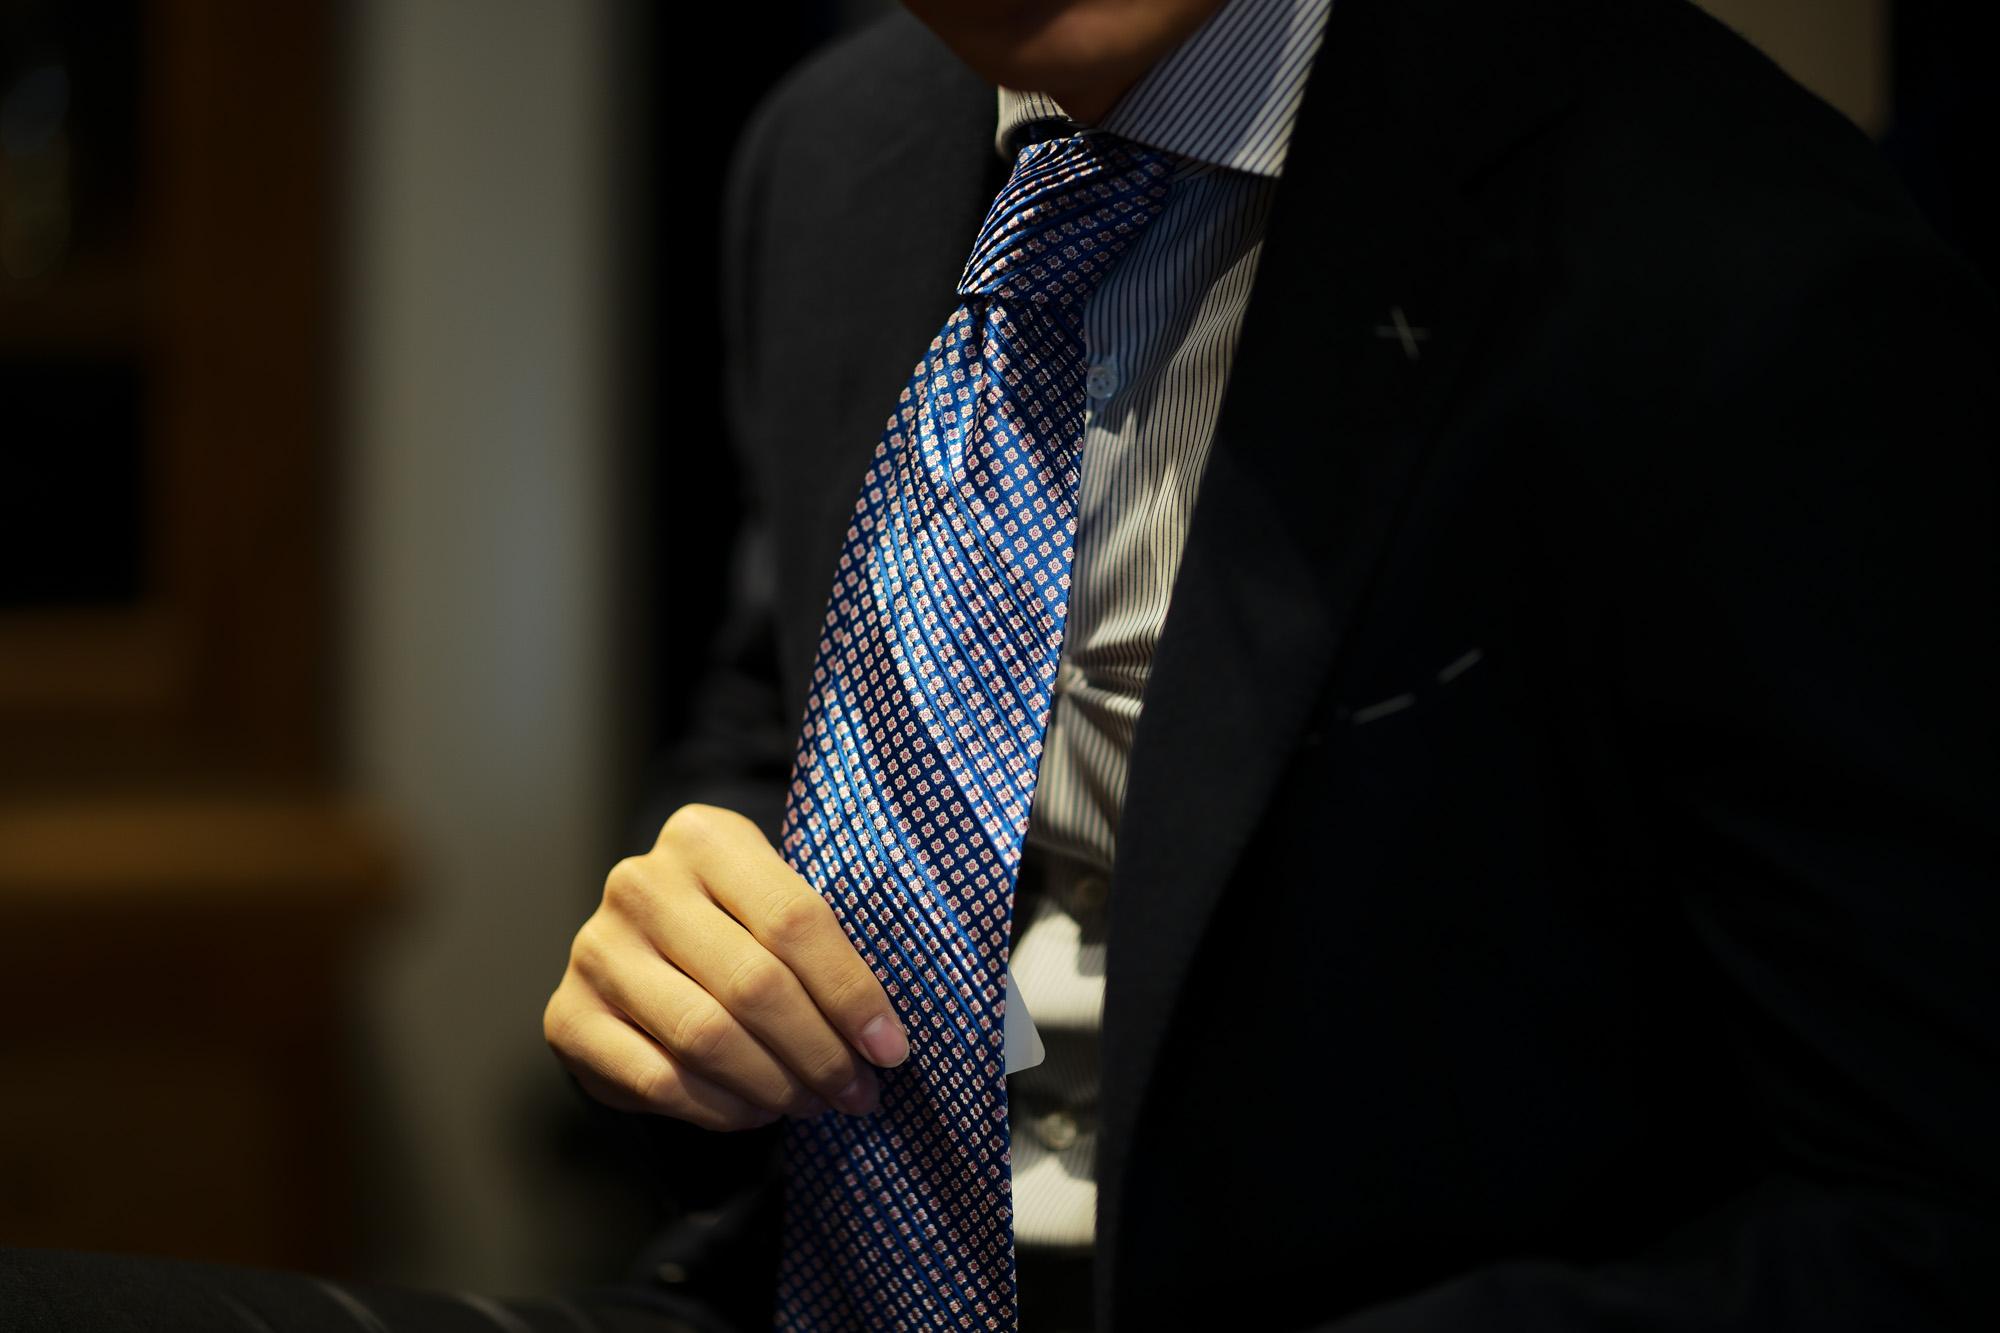 STEFANO RICCI (ステファノリッチ) PLEATS TIE (プリーツタイ) シルク プリント プリーツ ネクタイ BLUE×PINK (ブルー×ピンク) Made in italy (イタリア製) 2018 秋冬新作 stefanoricci 愛知 名古屋 alto e diritto アルトエデリット altoediritto